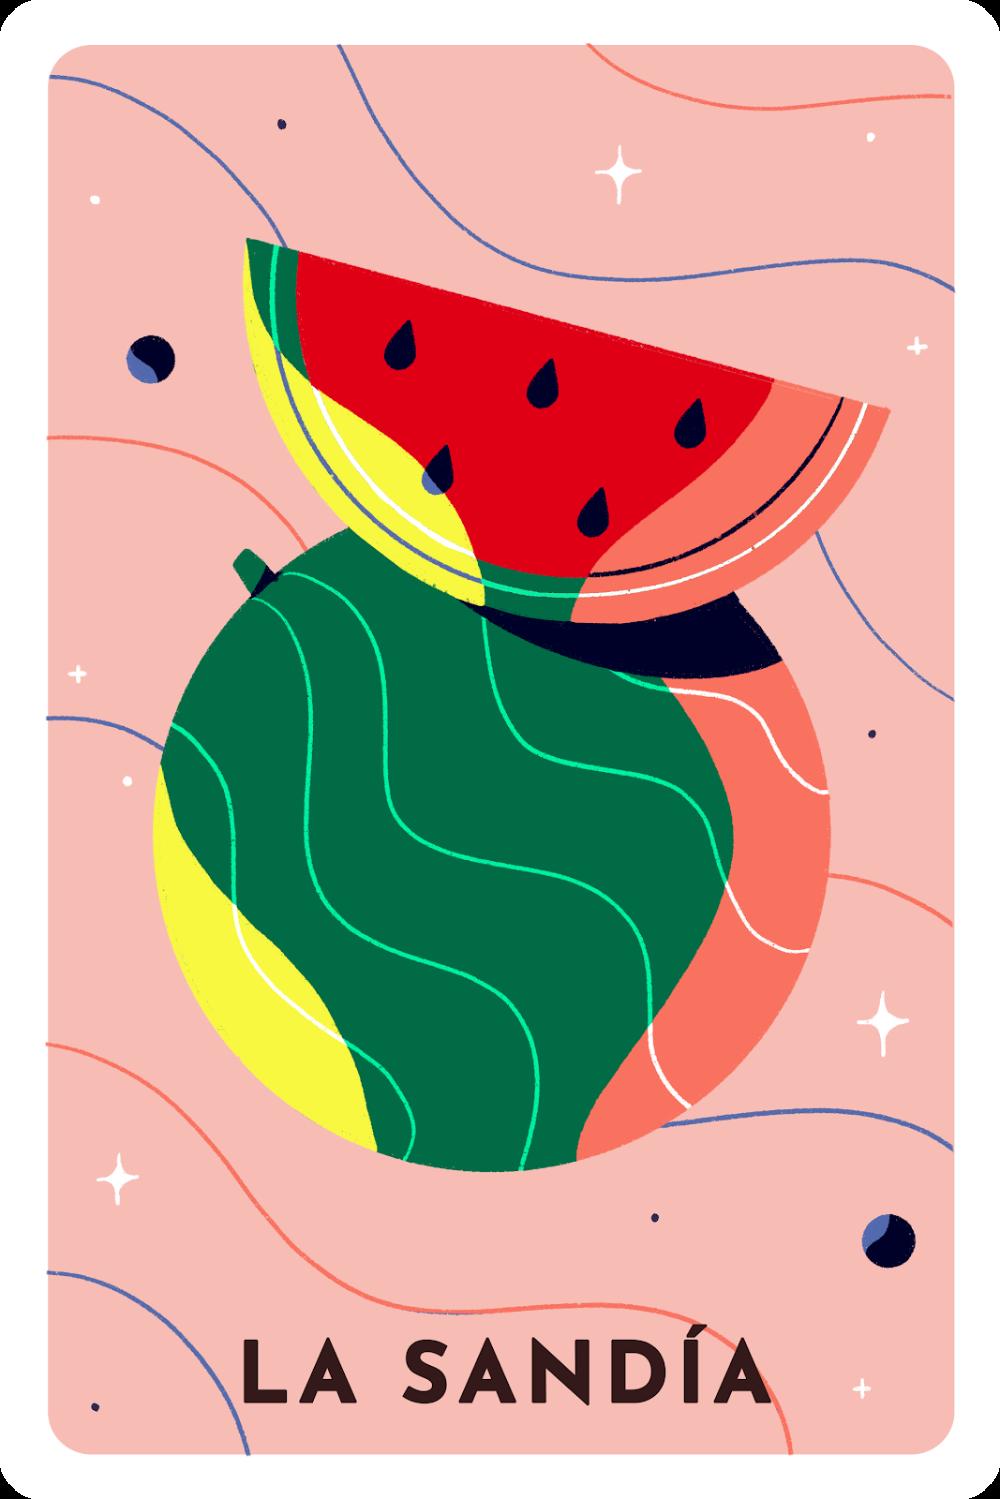 Celebrating Lotería! in 2020 Card illustration, Loteria